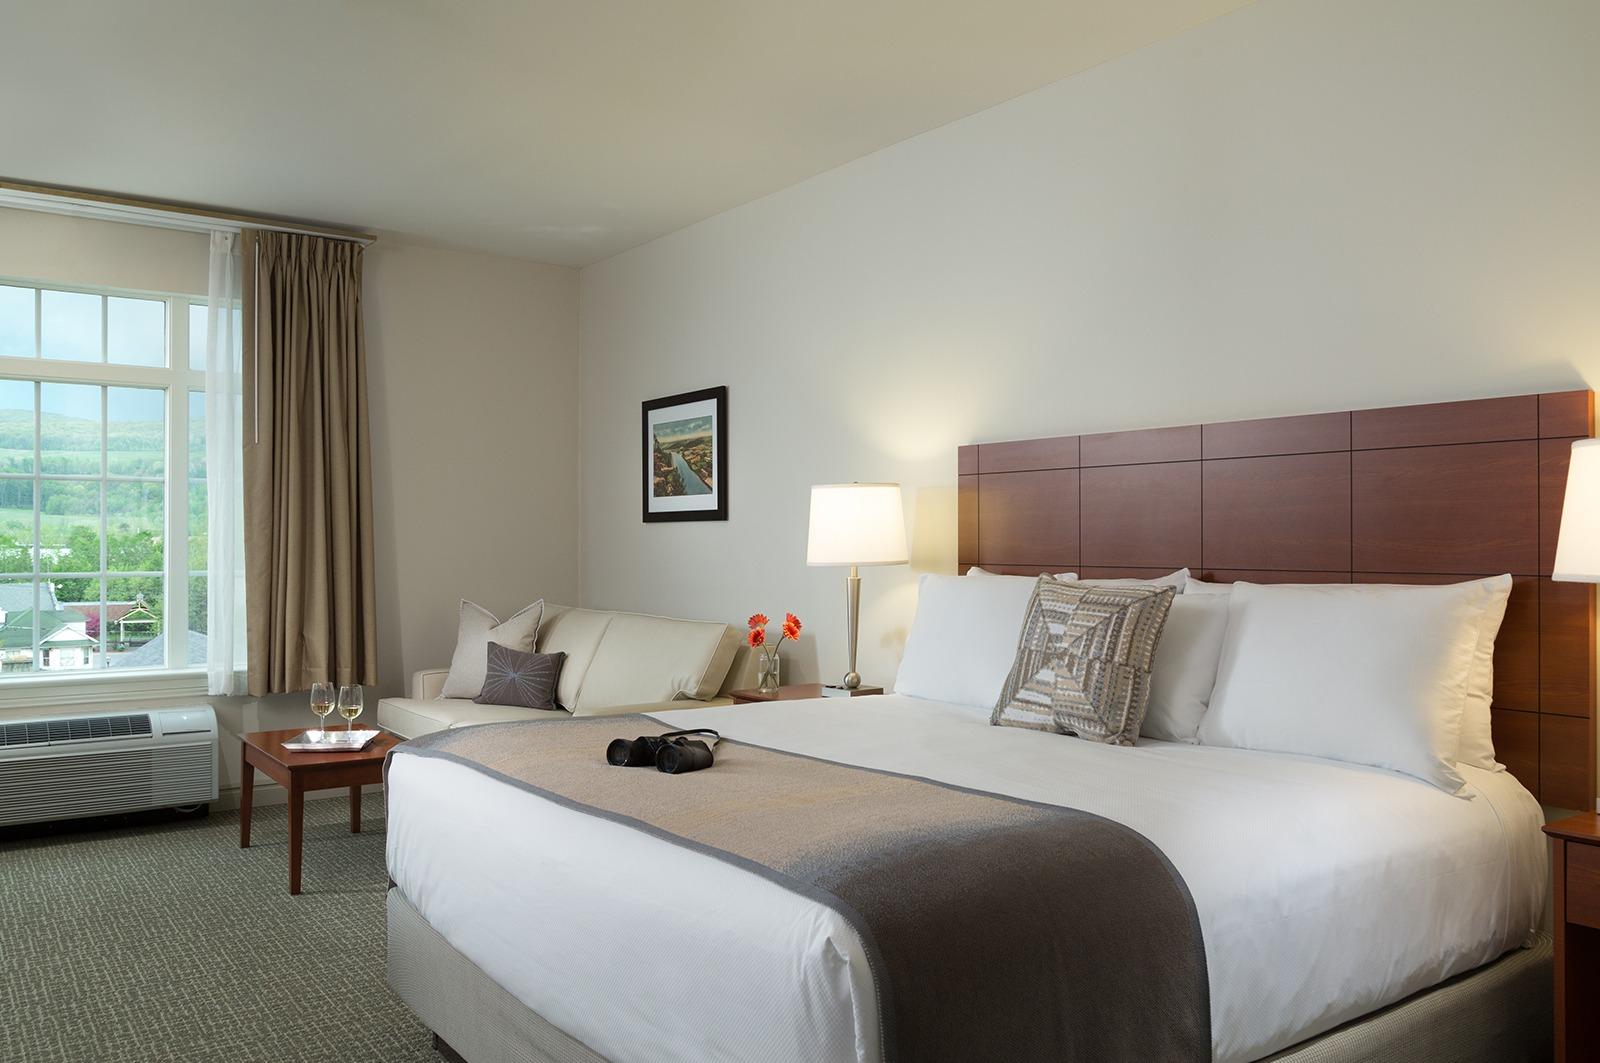 HotelAnthracite_KingRoom - Hotel Anthracite